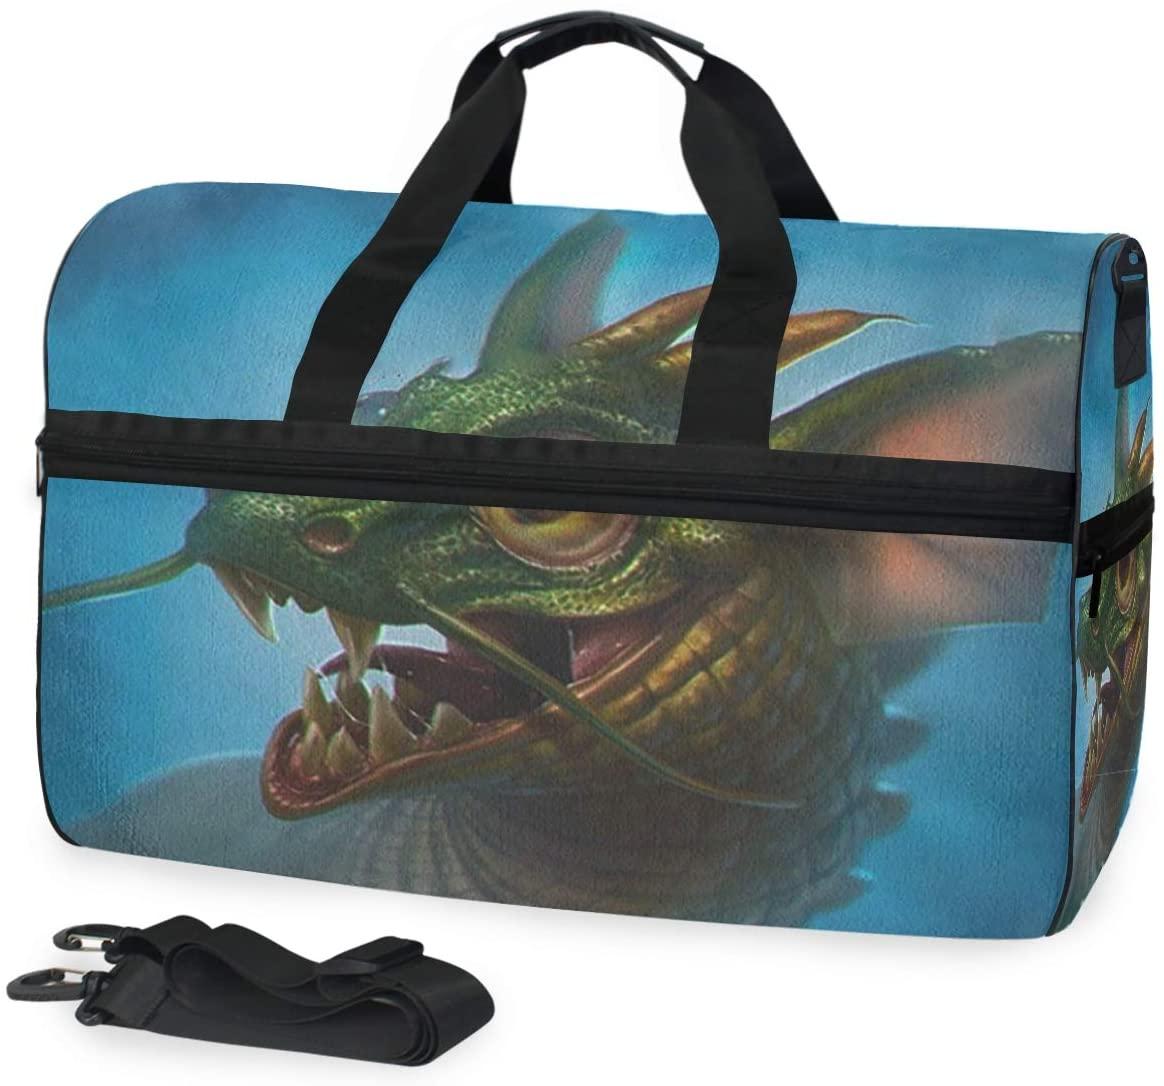 SLHFPX Gym Bag Green Dragon Duffle Bag Large Sport Travel Bags for Men Women